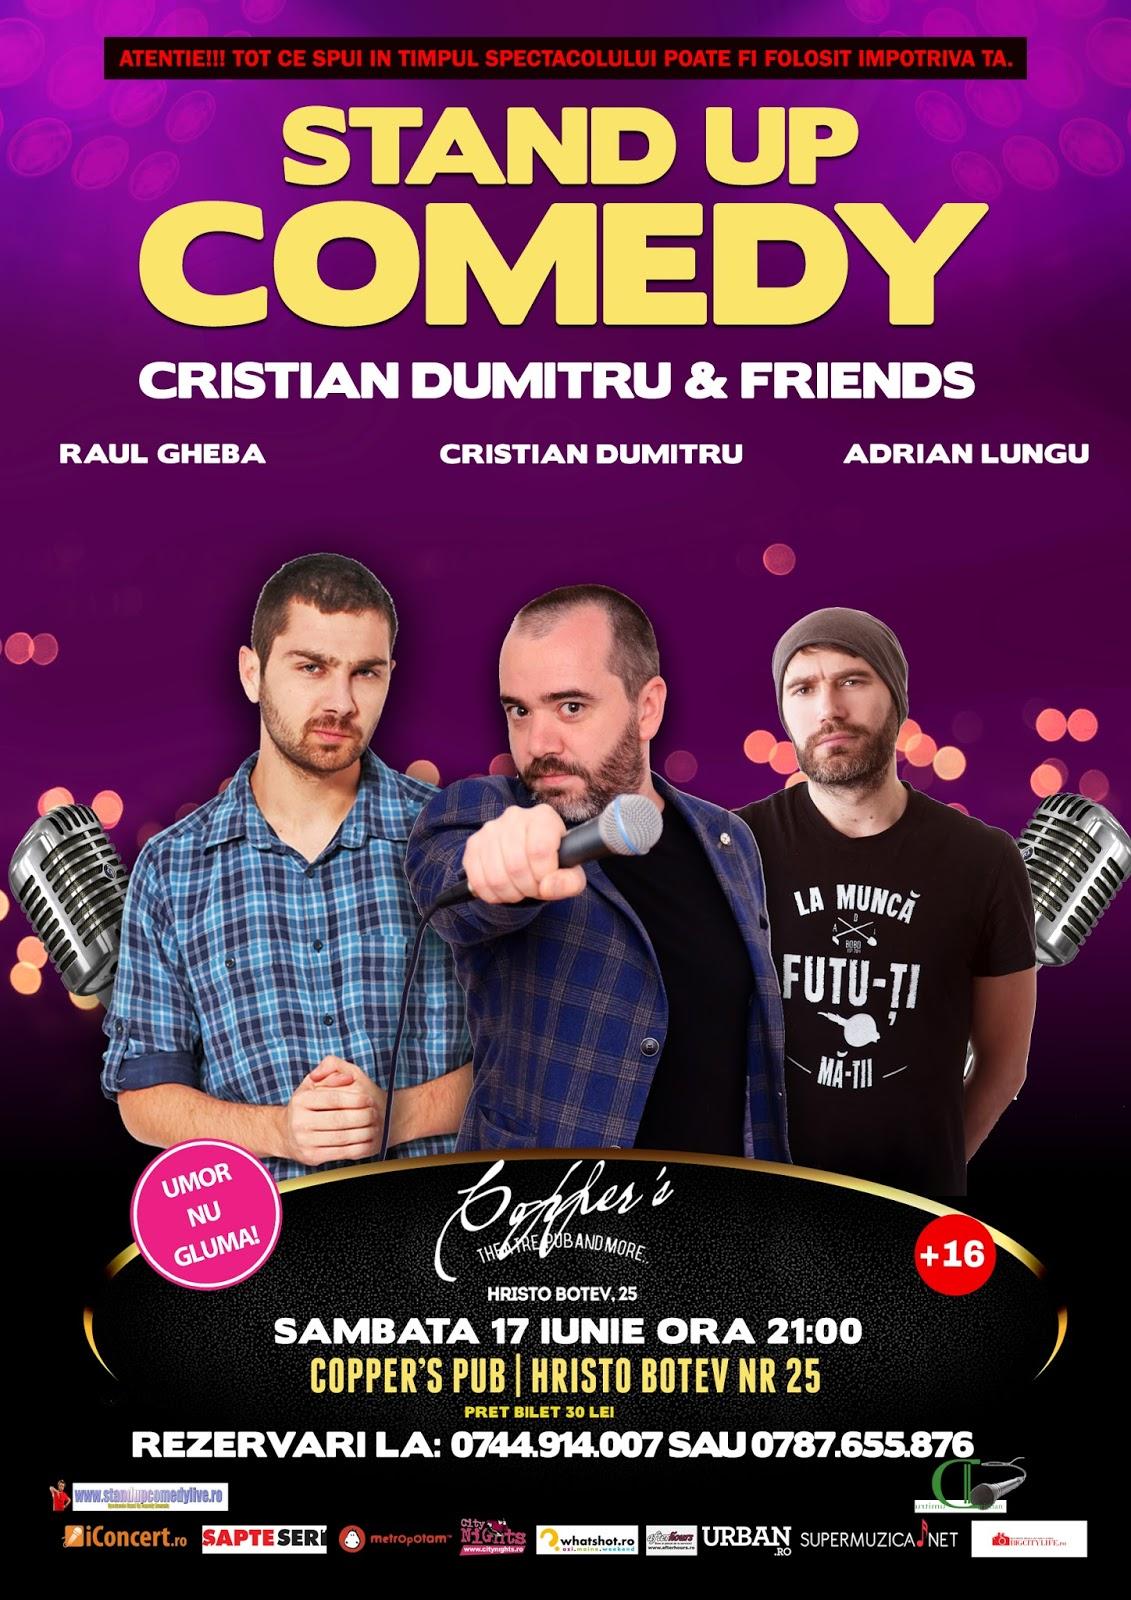 Stand-Up Comedy Sambata 17 Iunie Bucuresti ora 21